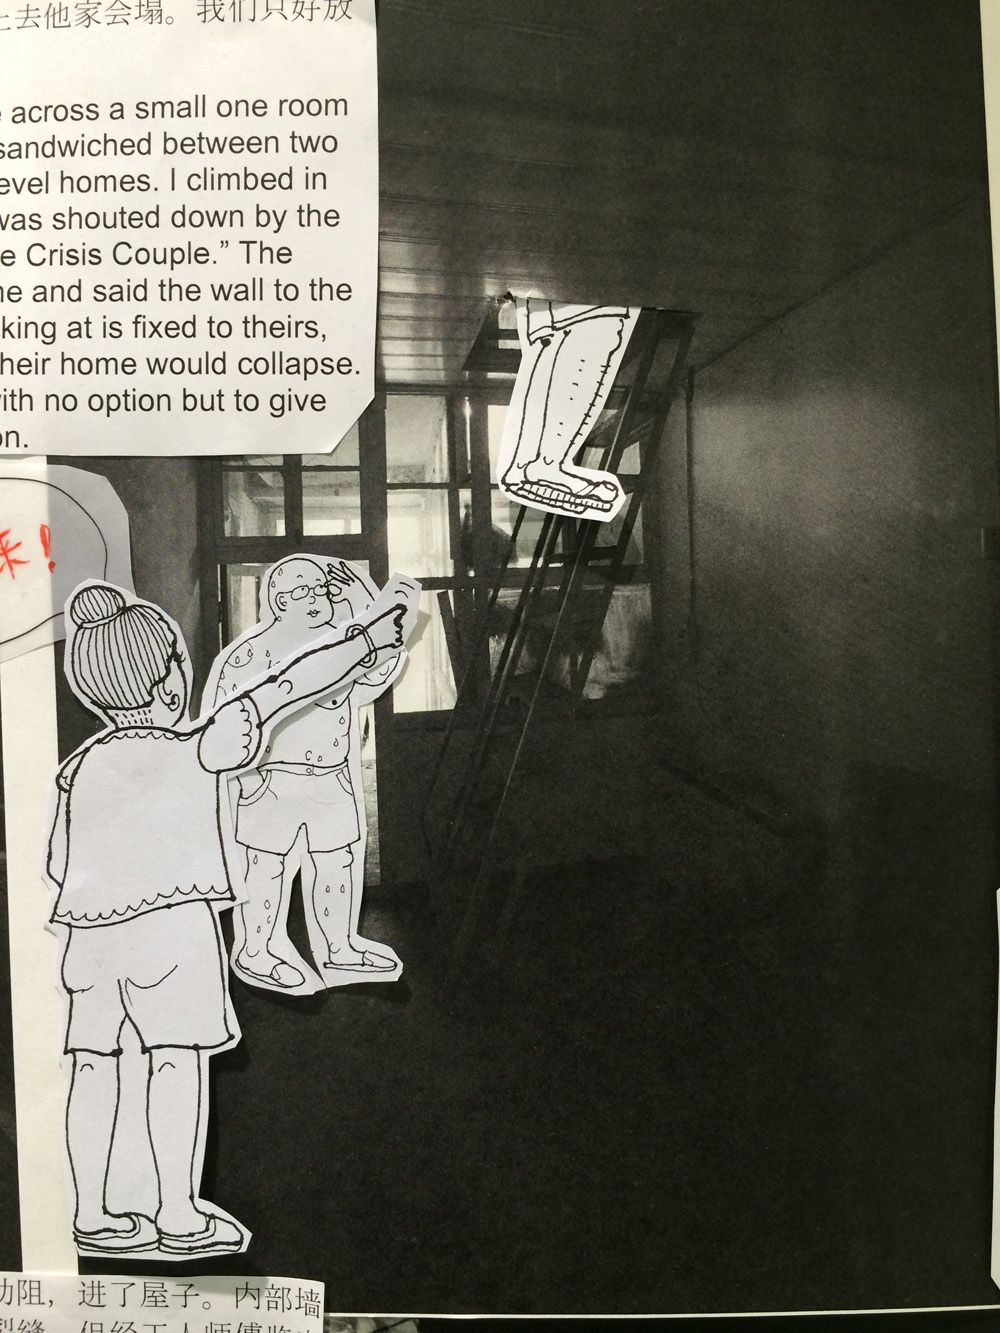 Caopu-humble-hostel-story-hisheji (2)